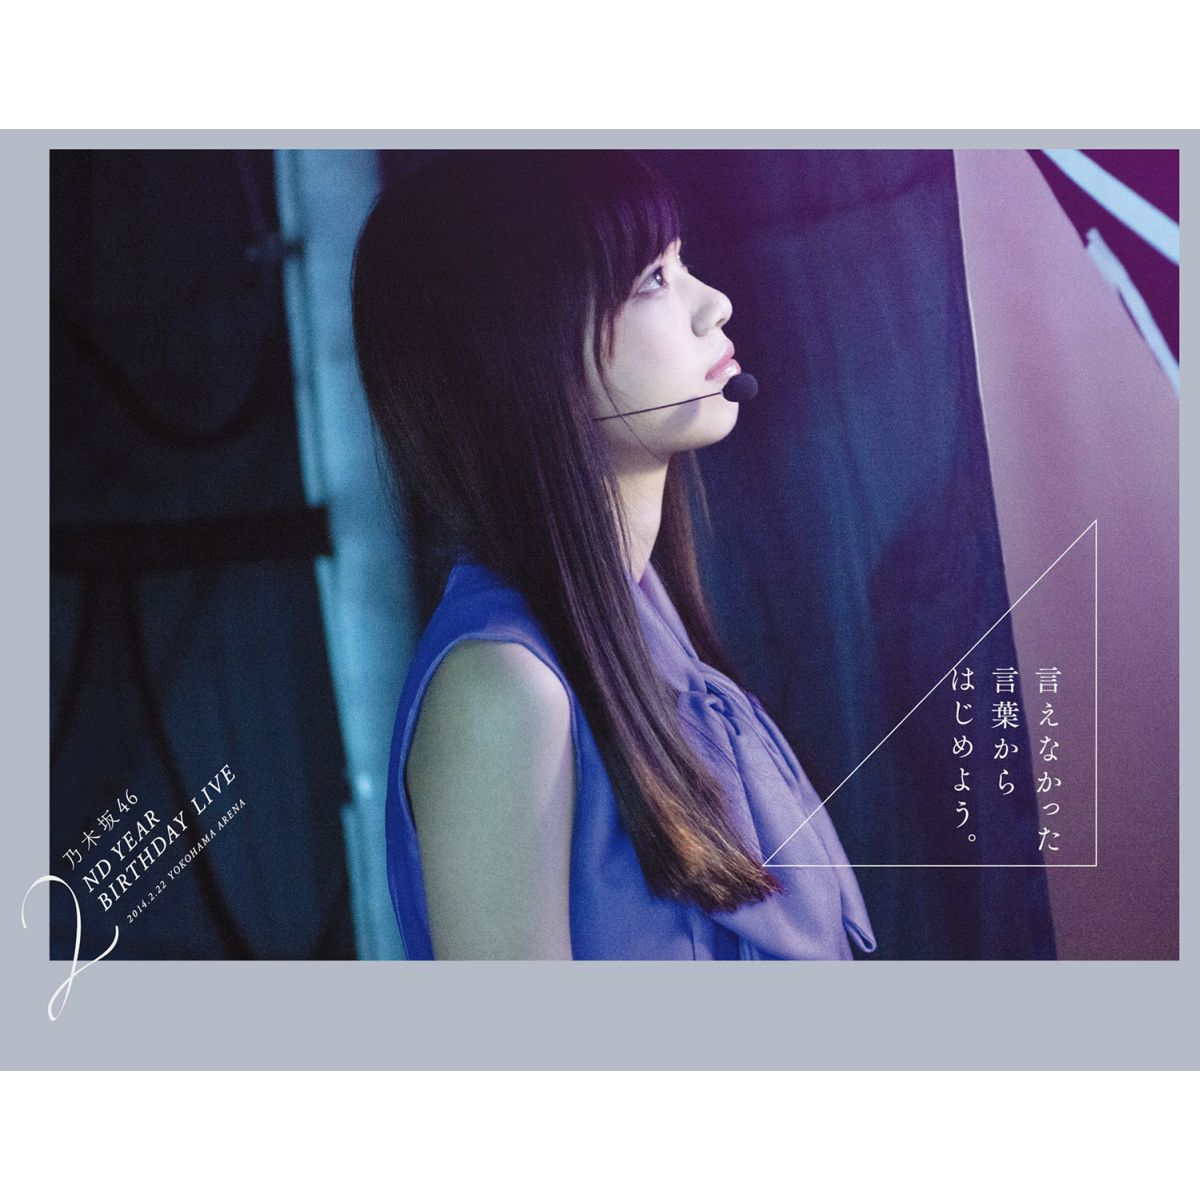 �M�y �T�؍�46 2nd YEAR BIRTHDAY LIVE 2014.2.22 YOKOHAMA ARENA(���S���Y�����)[SRXL-69/70][Blu-ray/�u���[���C]